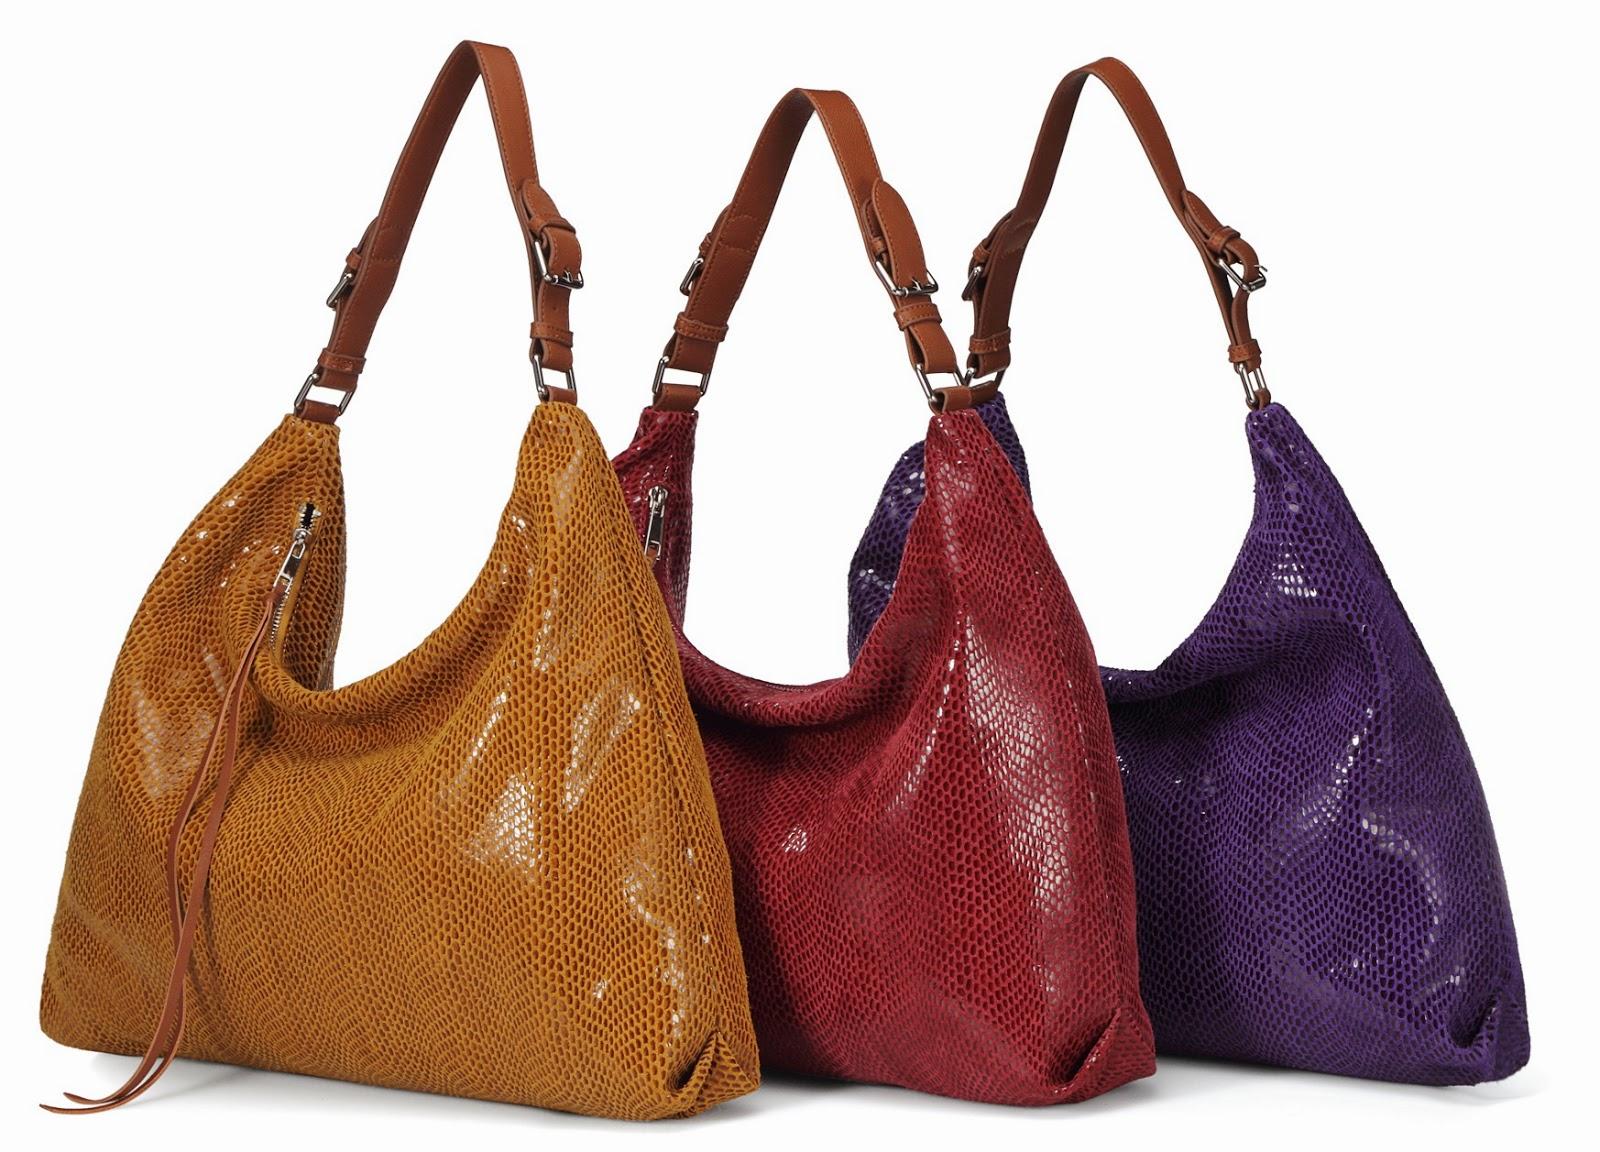 Carry On Sorial Fall 2017 Handbag Collection